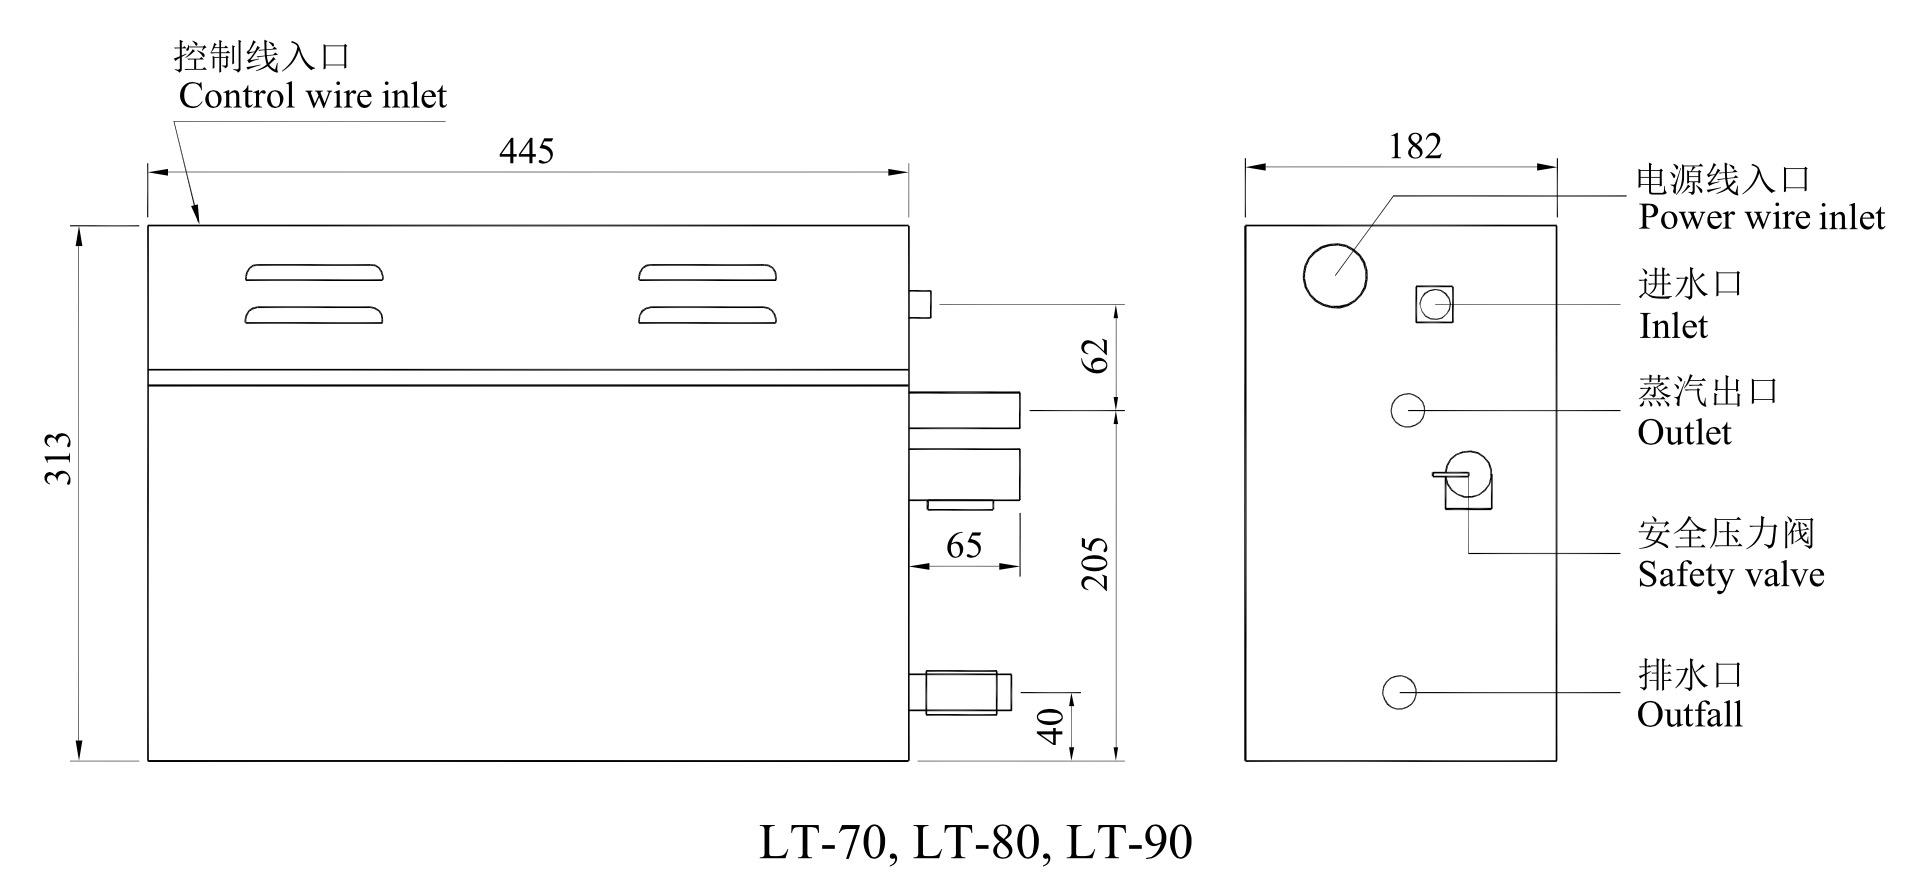 LT-70, LT-80, LT-90